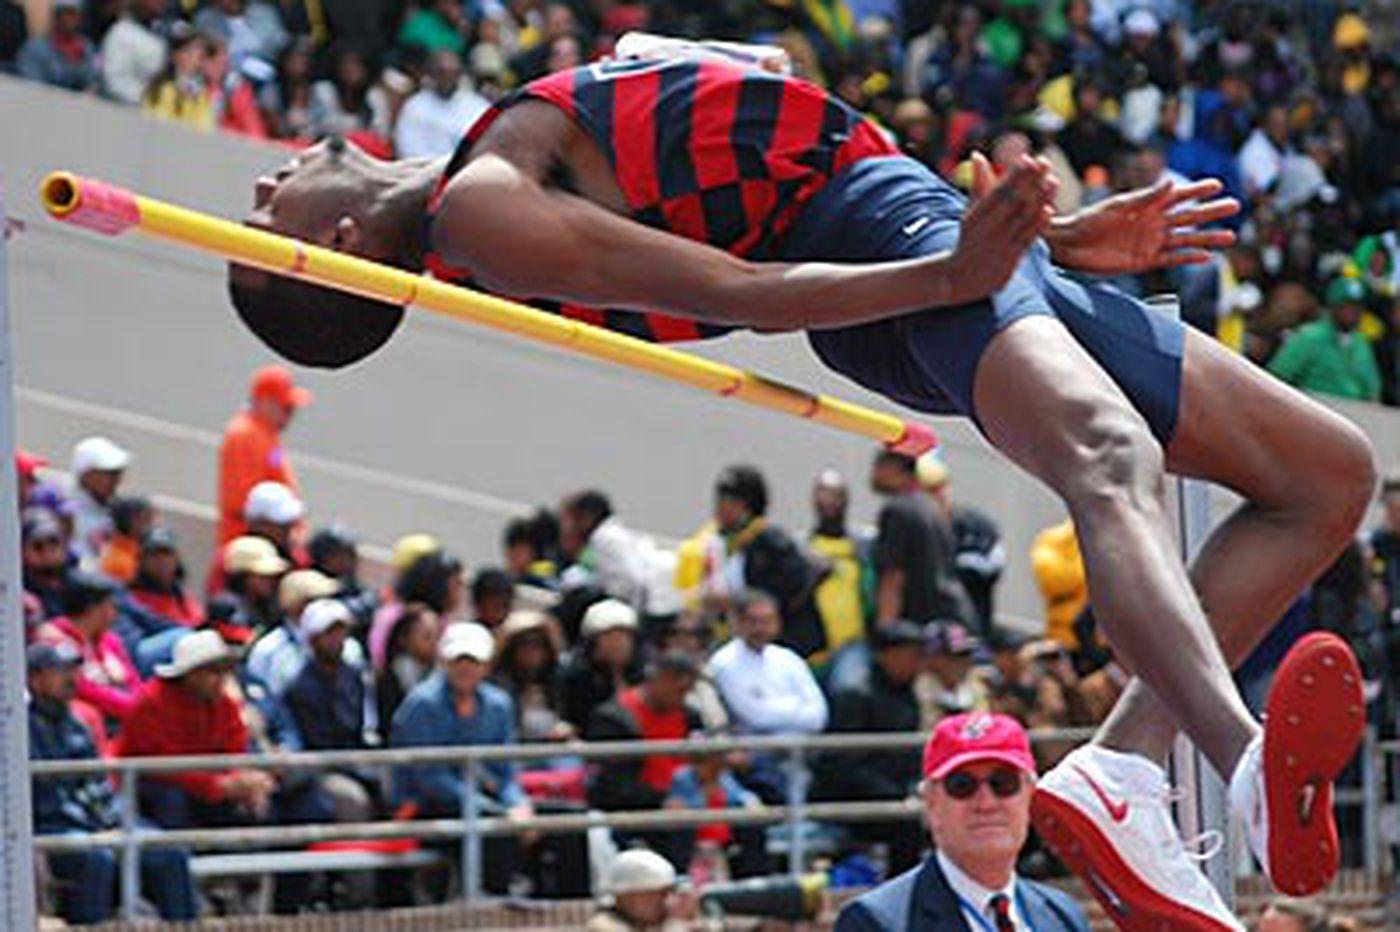 Quaker wins high jump